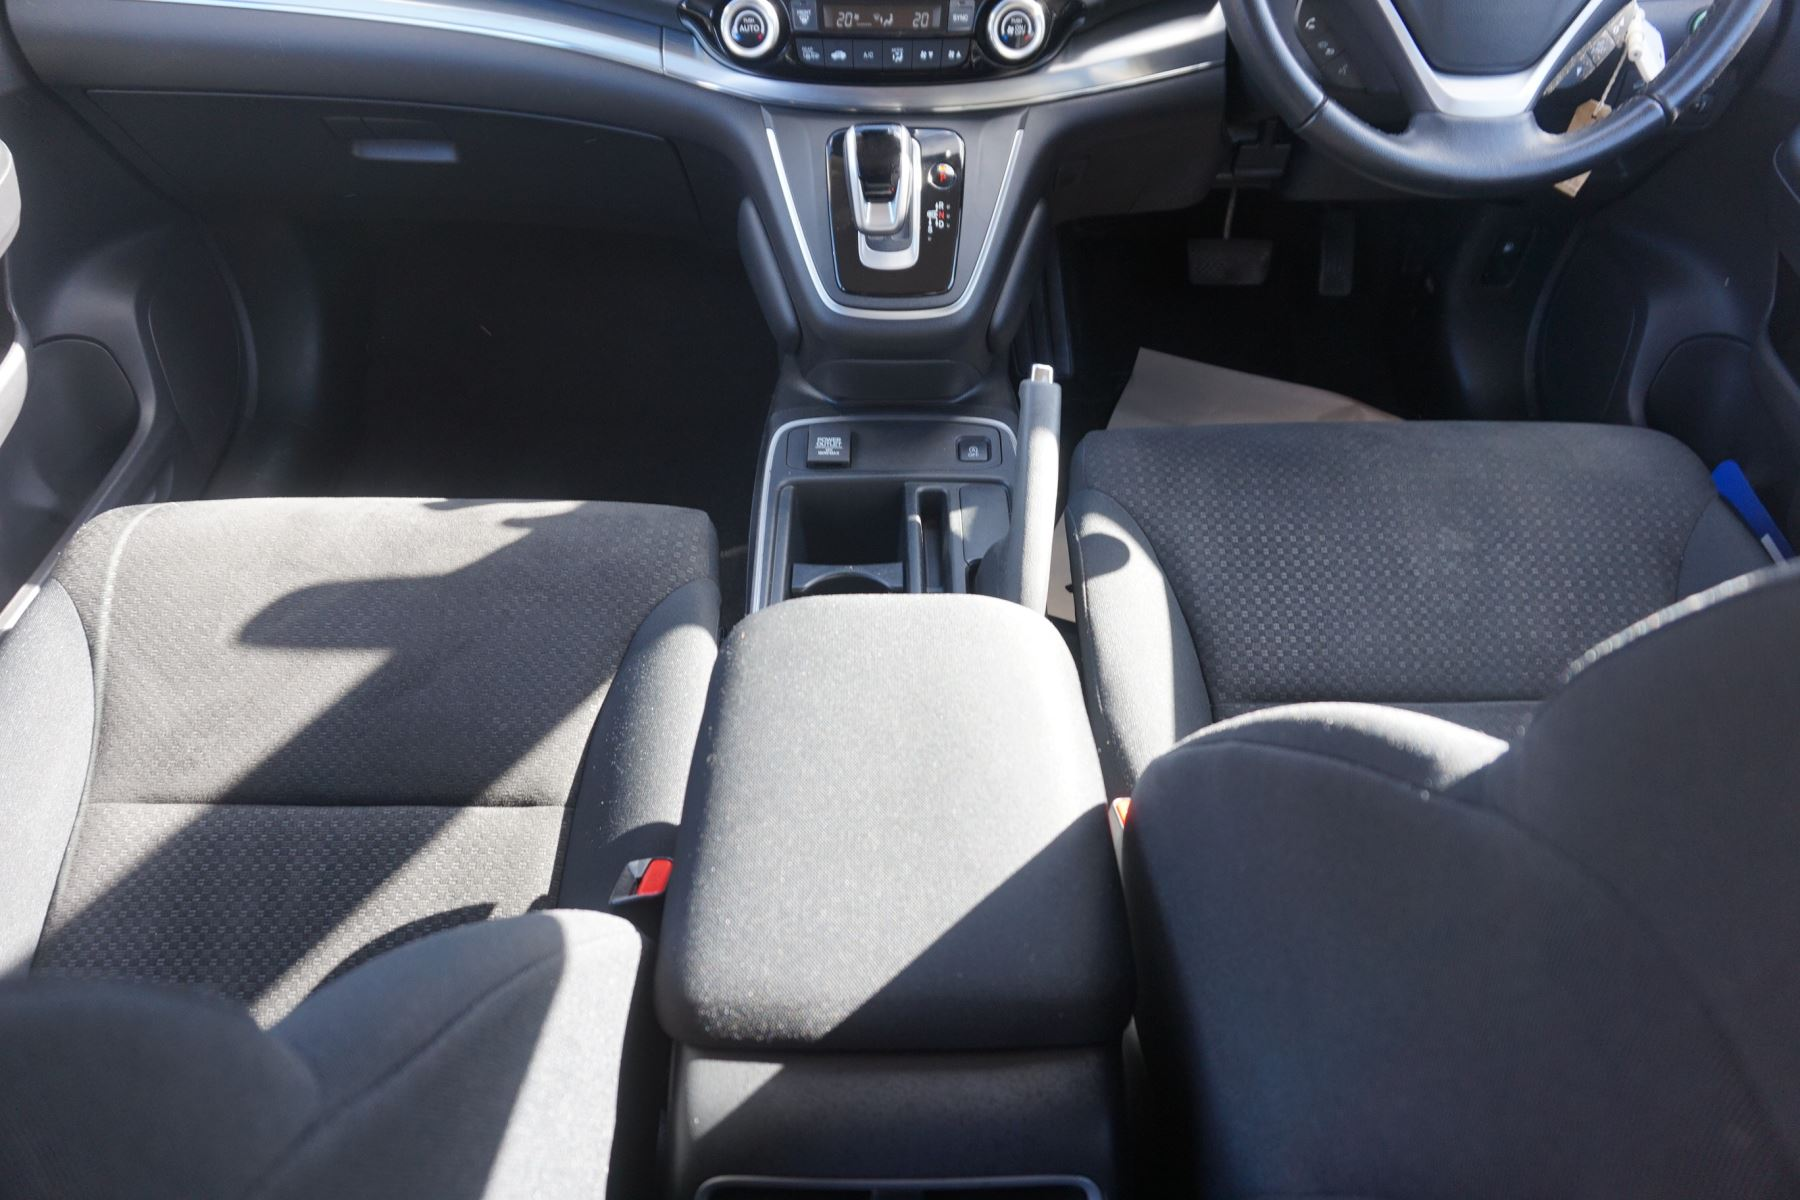 Honda CR-V 1.6 i-DTEC 160 SE Plus 5dr [Nav] 4WD image 13